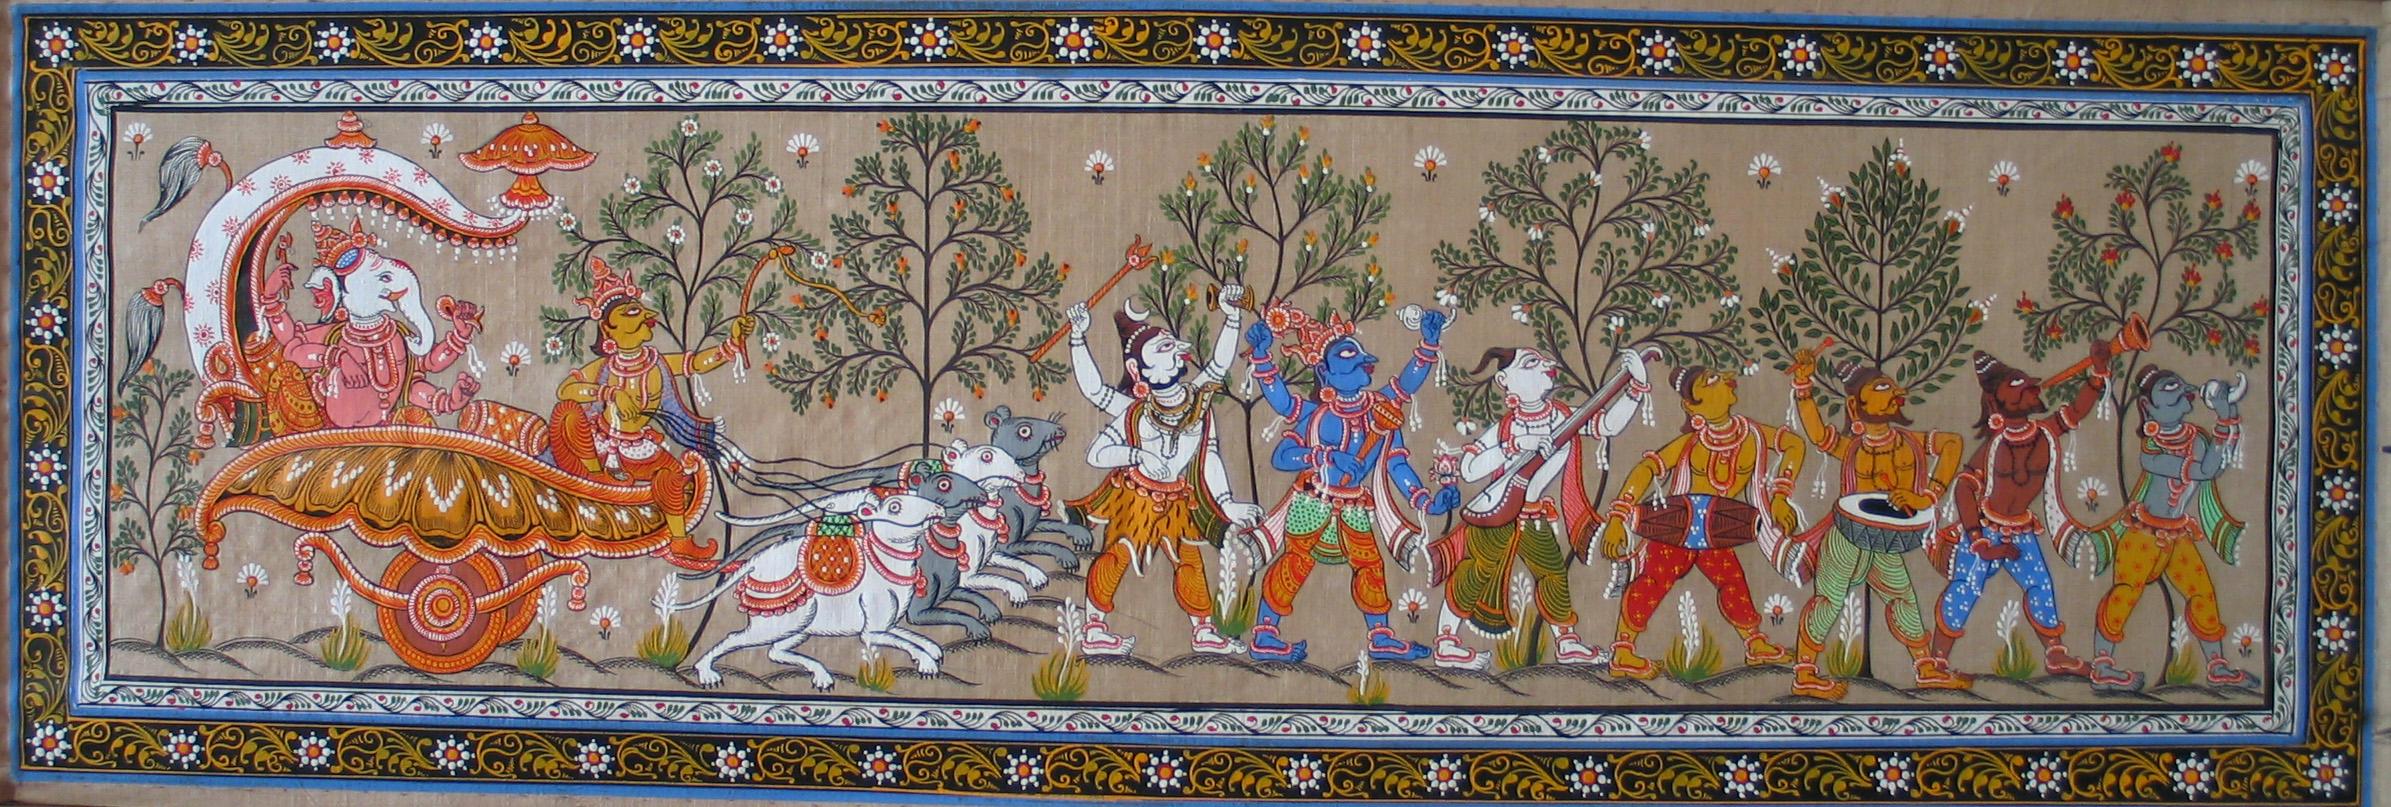 Kalamkari Paintings, the Ancient art of India